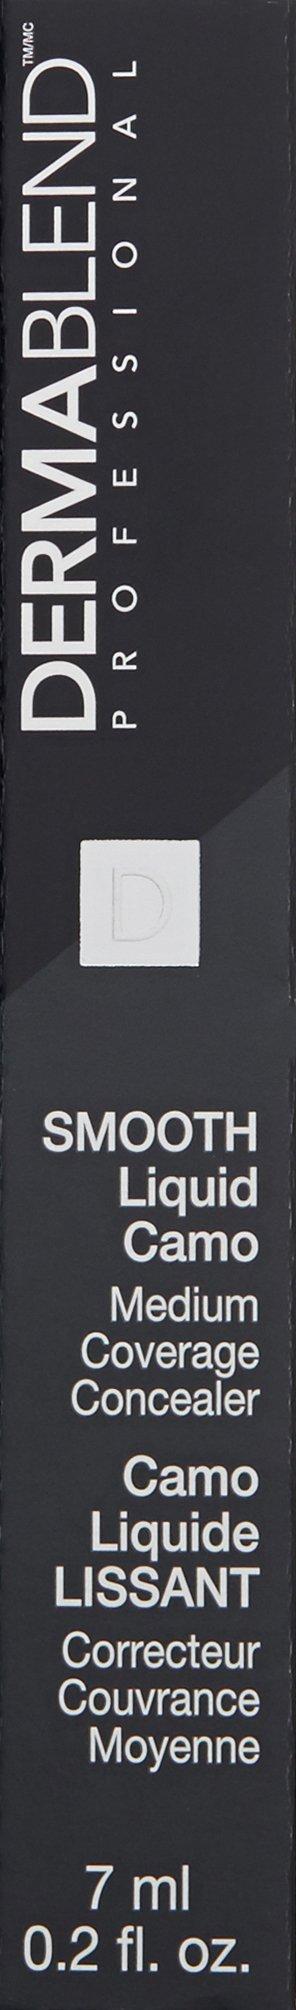 Dermablend Smooth Liquid Concealer, Fair, 0.2 Fl. Oz. by Dermablend (Image #4)